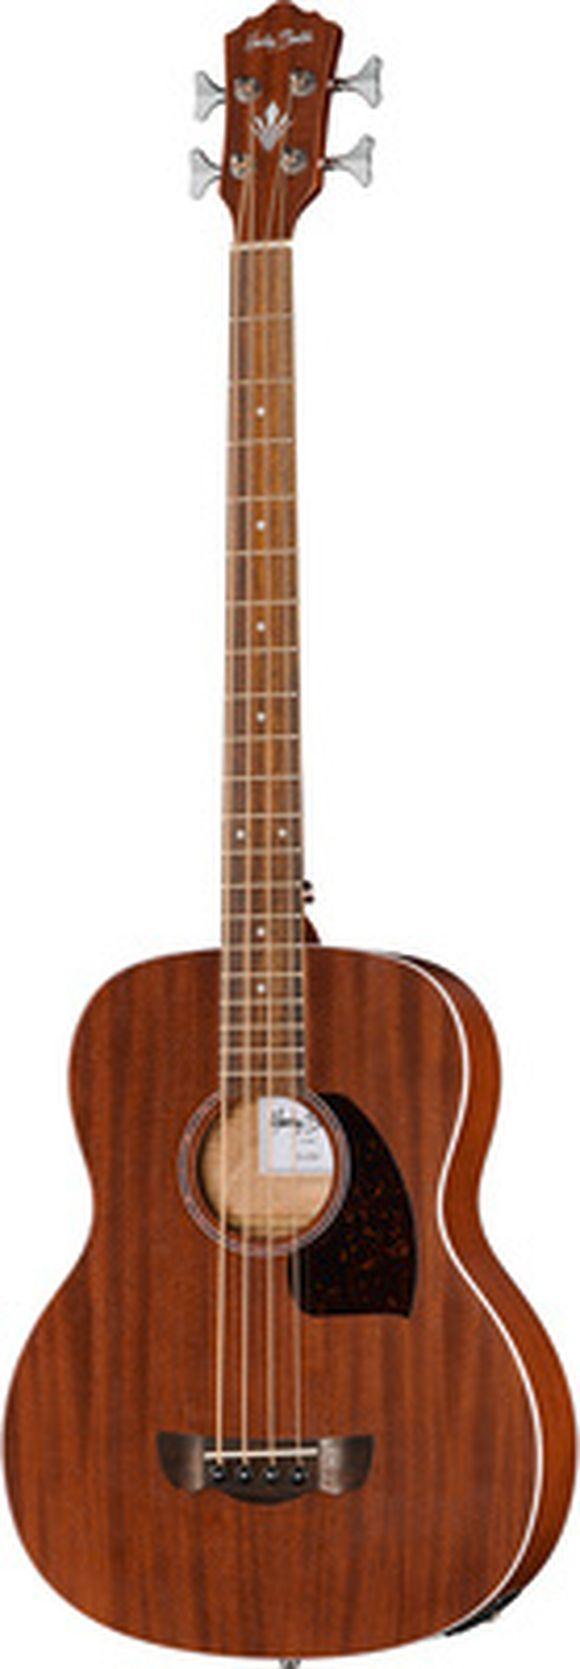 B-25M Acoustic Bass Harley Benton